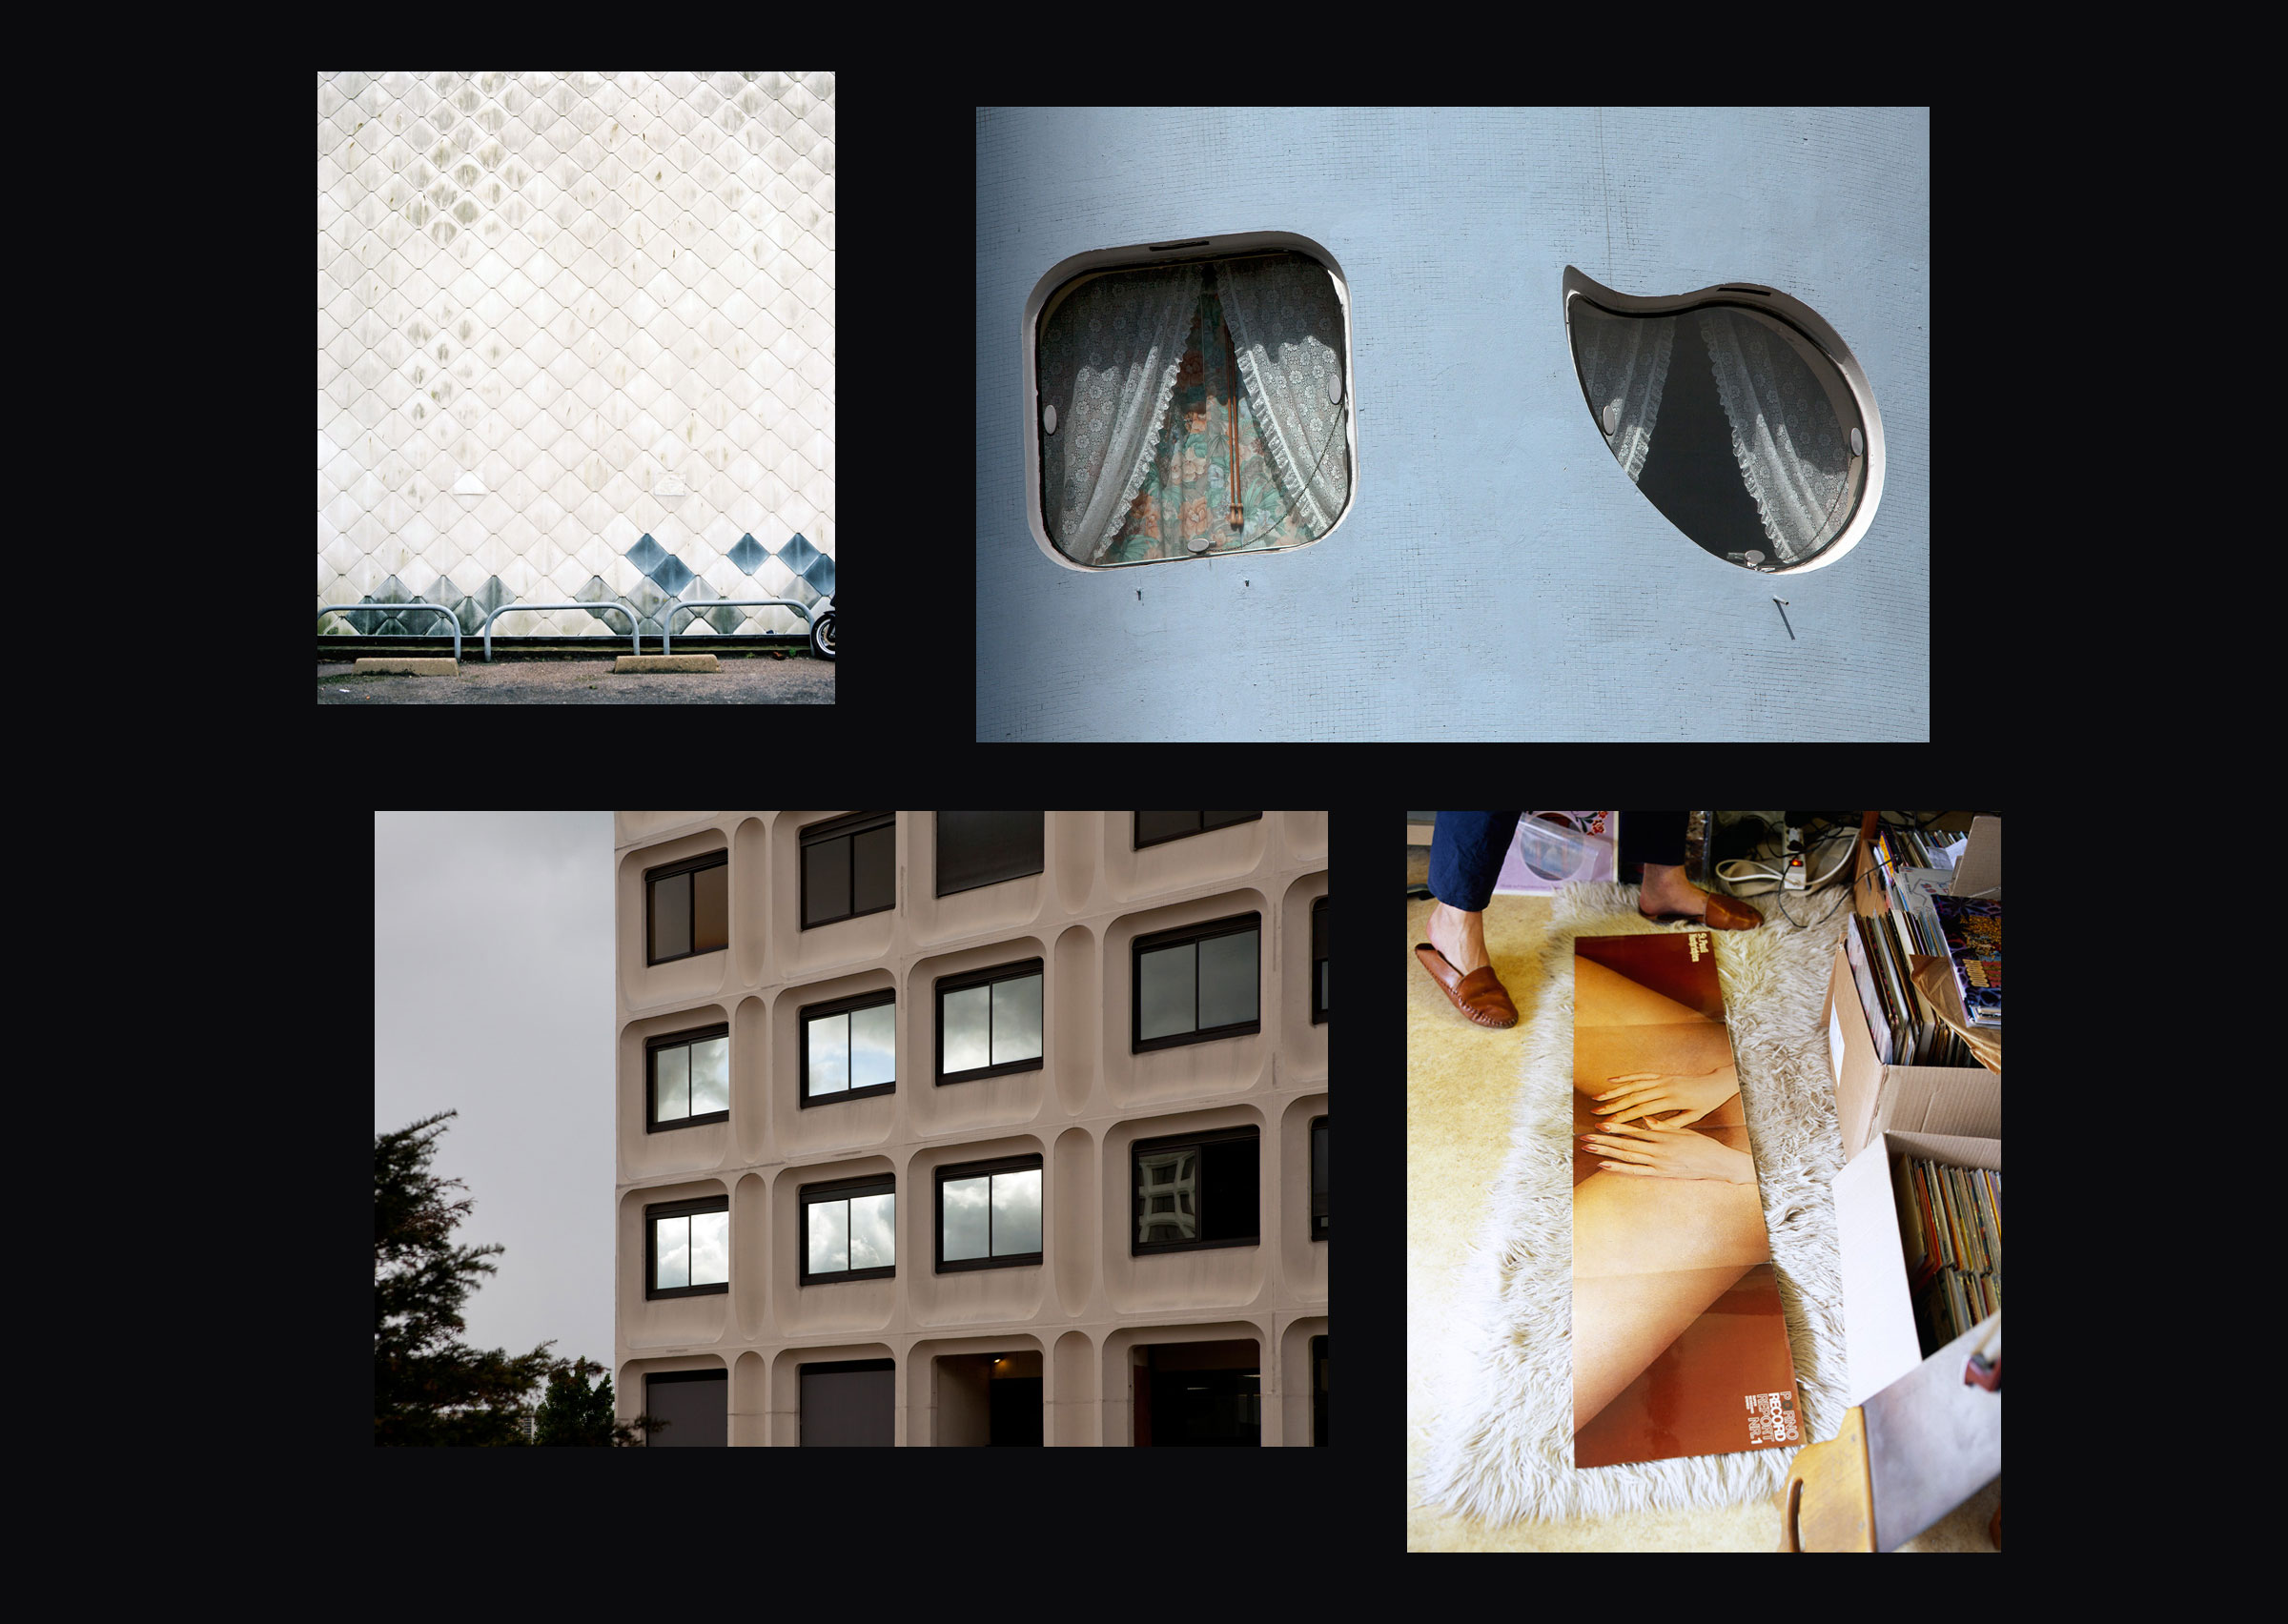 julien-lelievre-photographie-interview-index-grafik